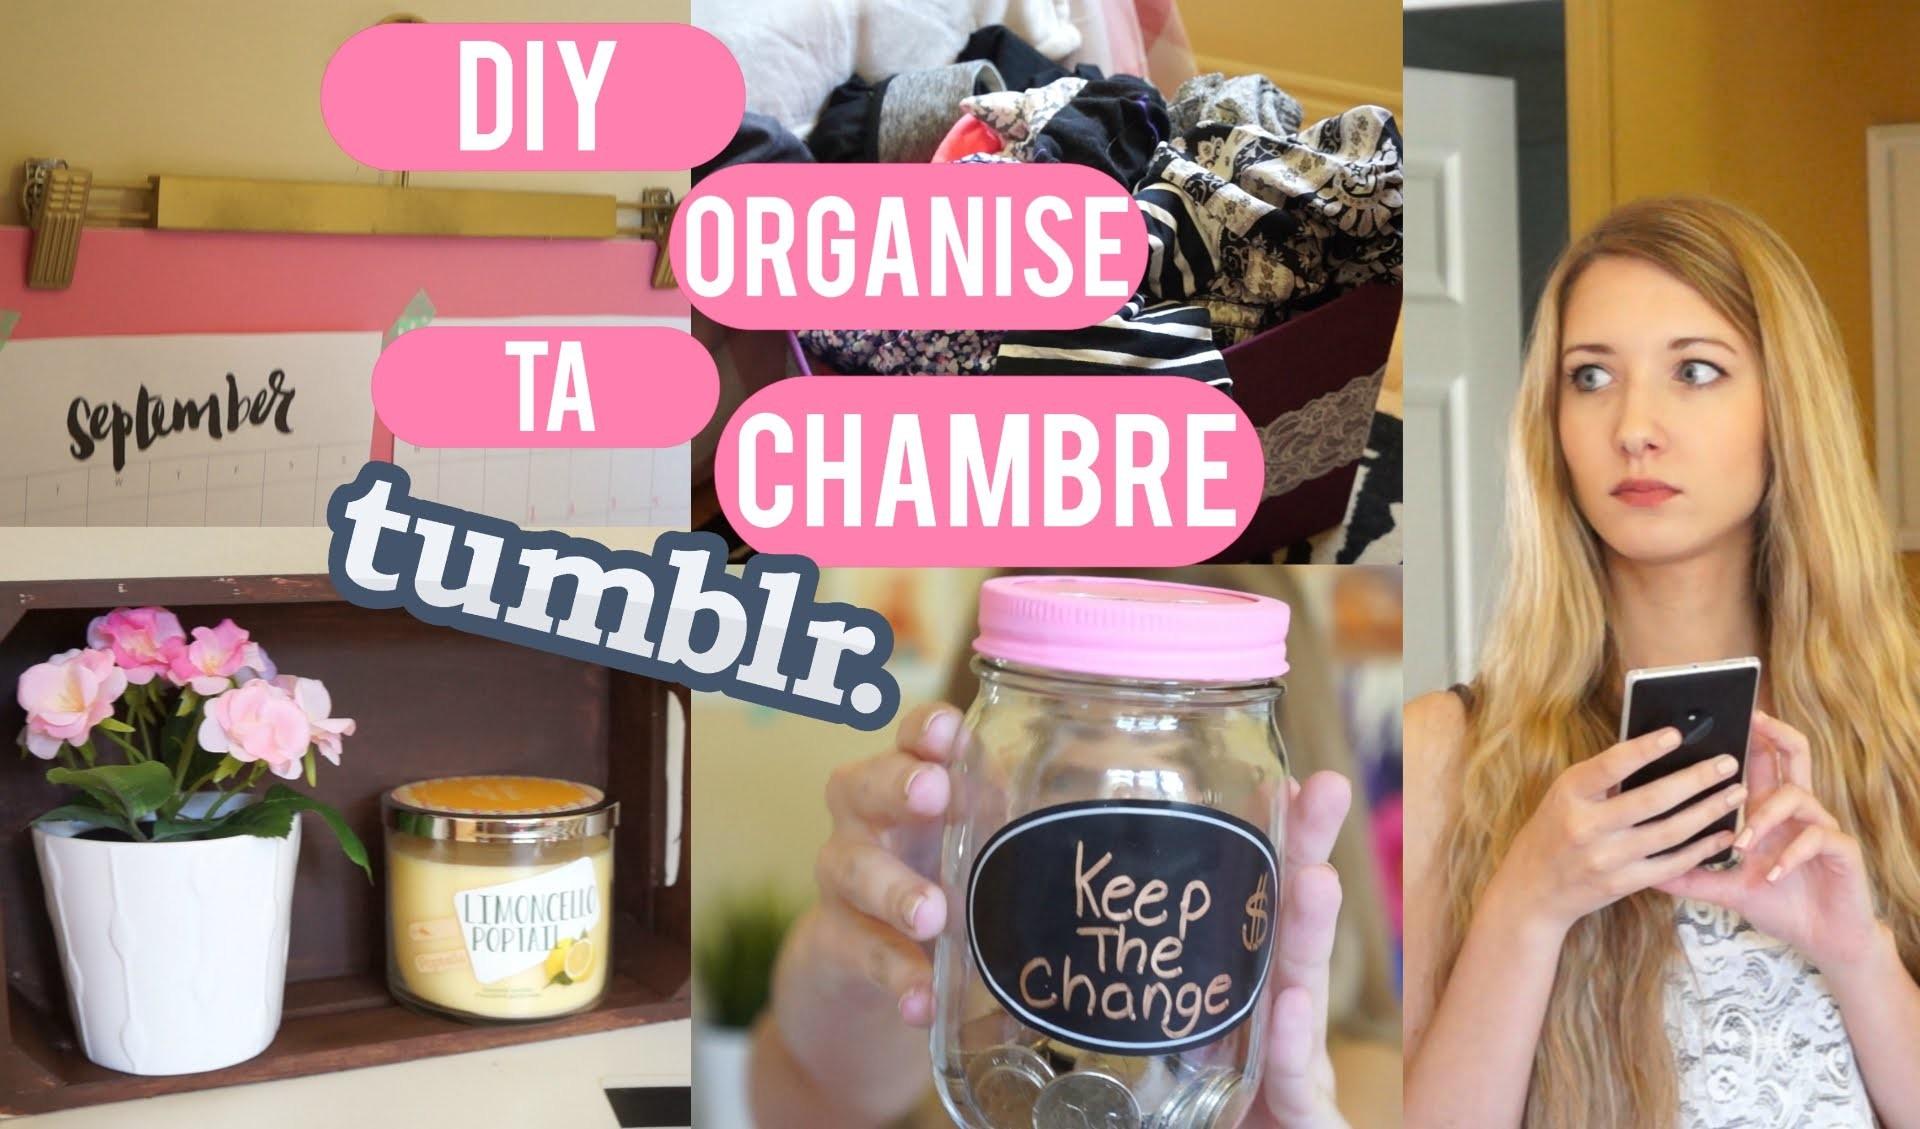 Diy, Organise Ta Chambre Inspiration Tumblr !, My Crafts